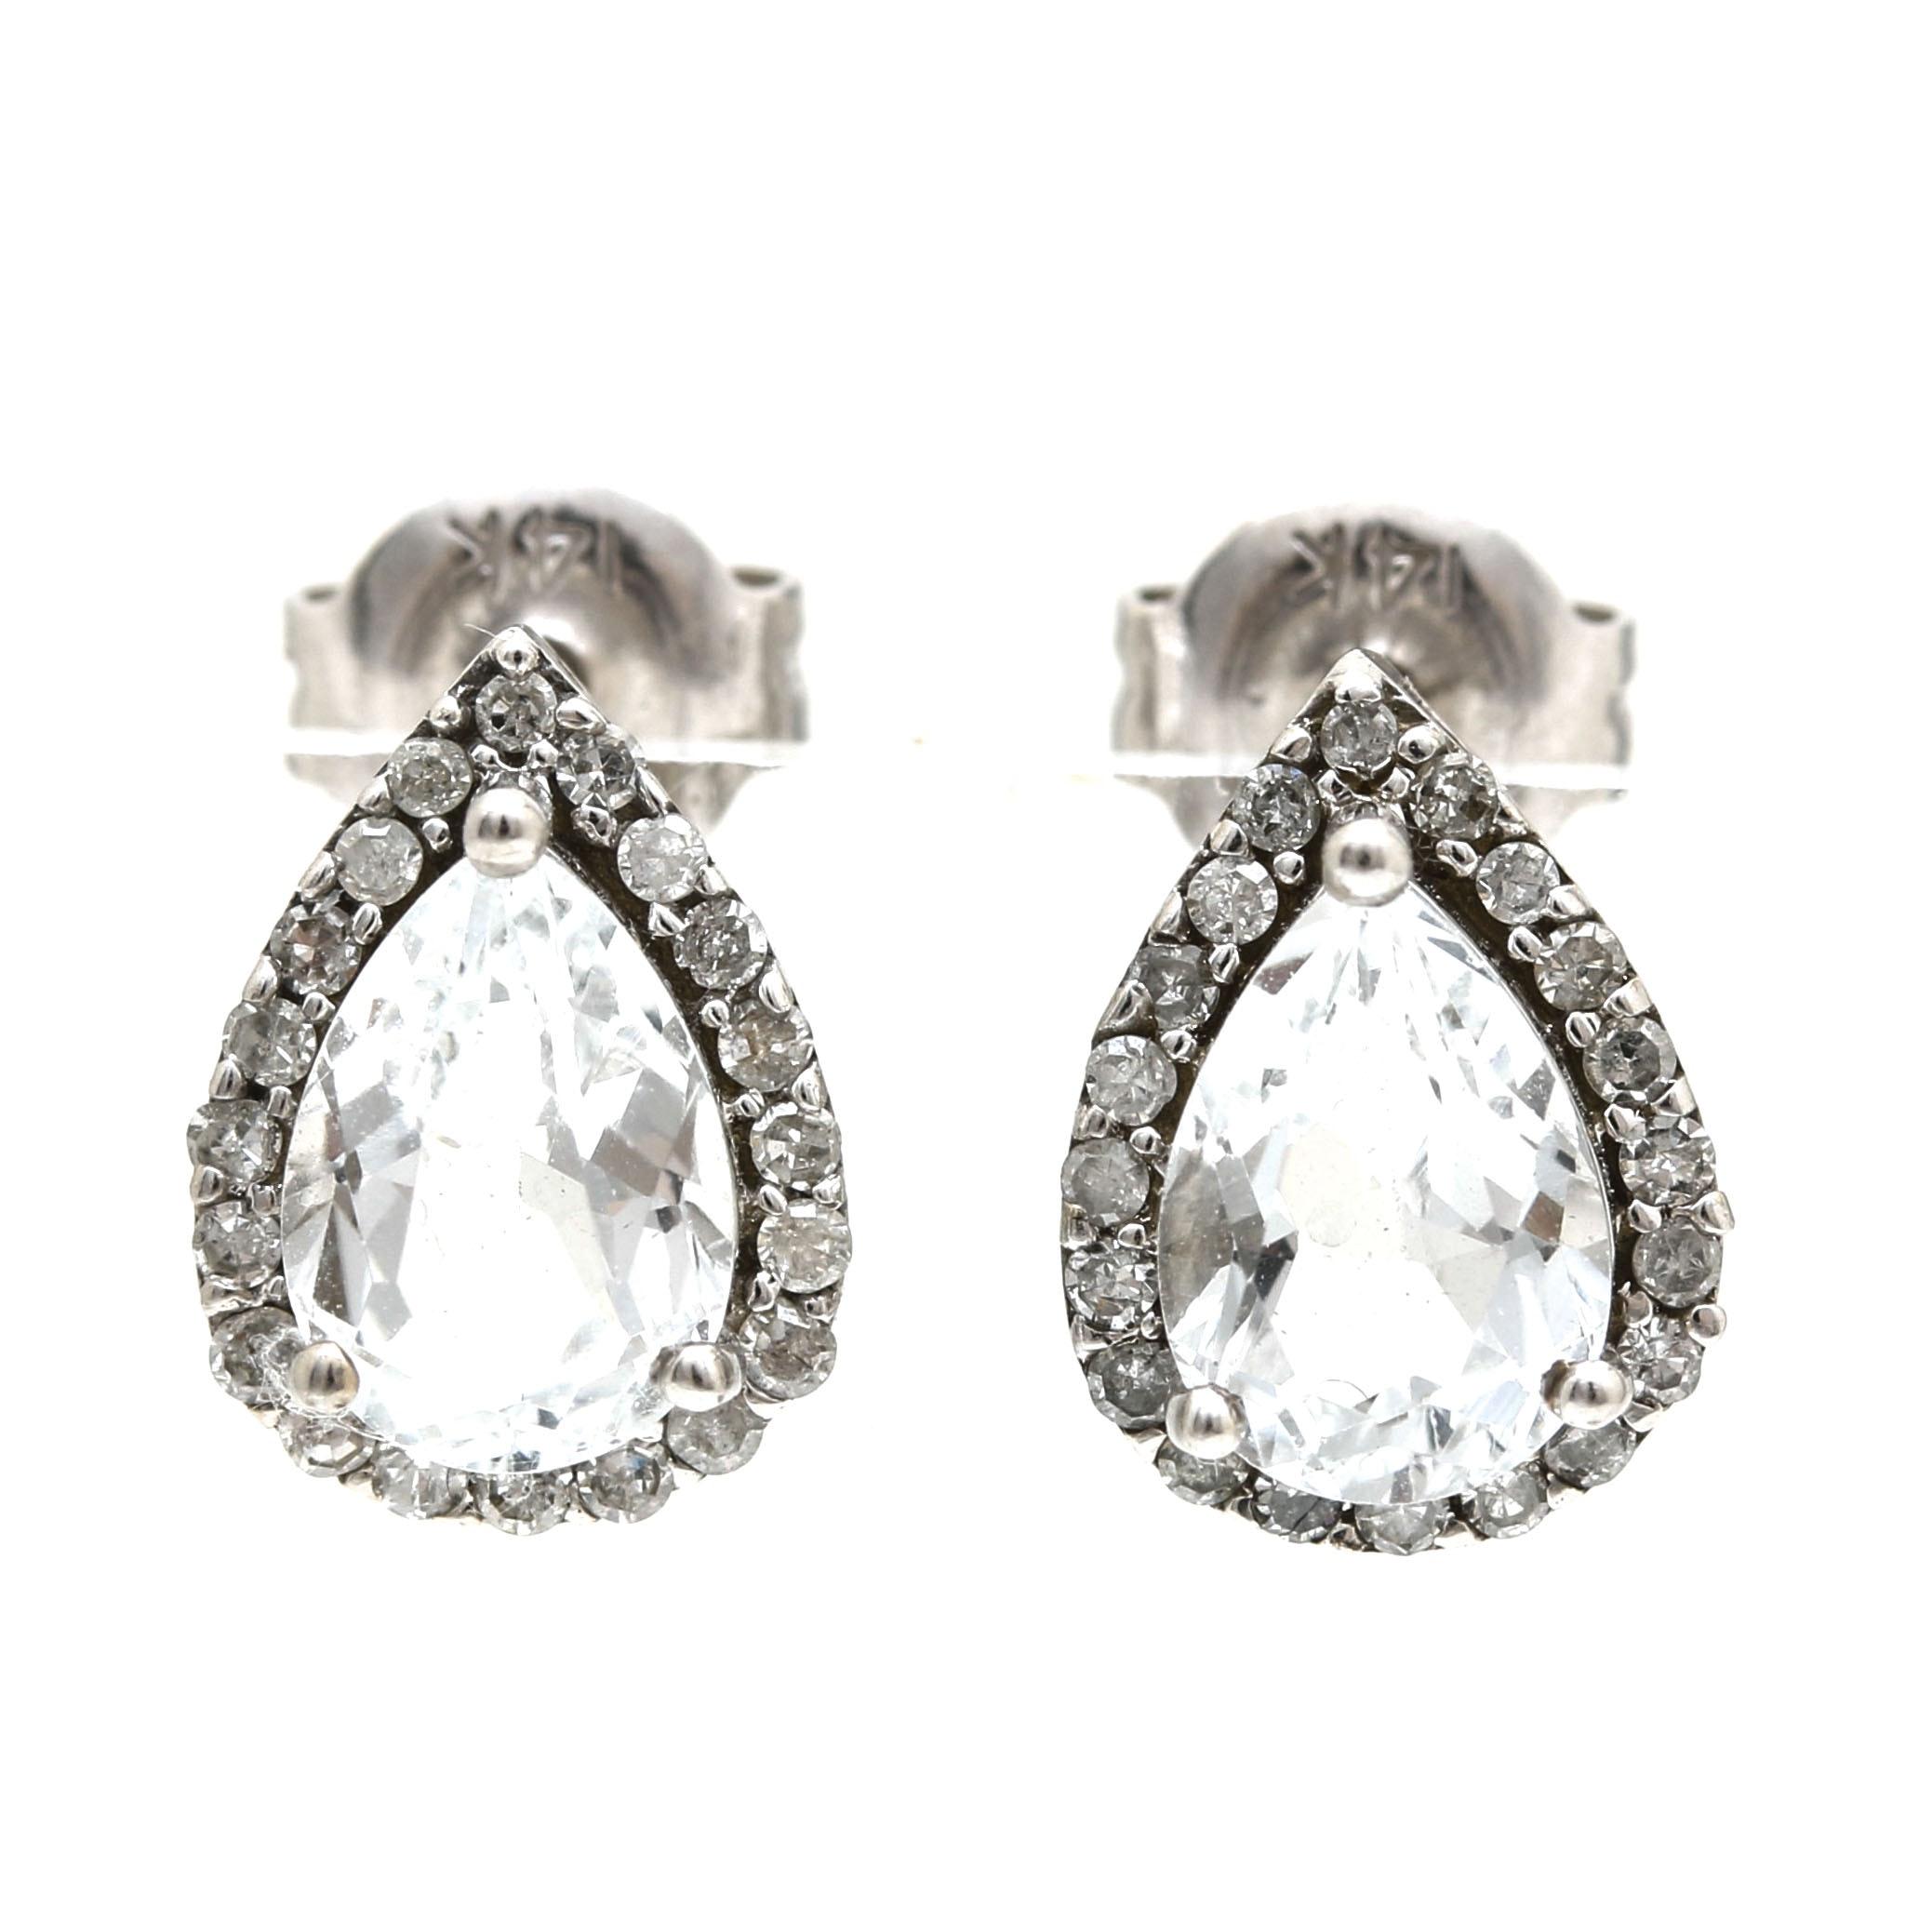 14K White Gold Sapphire and Diamond Tear Drop Earrings